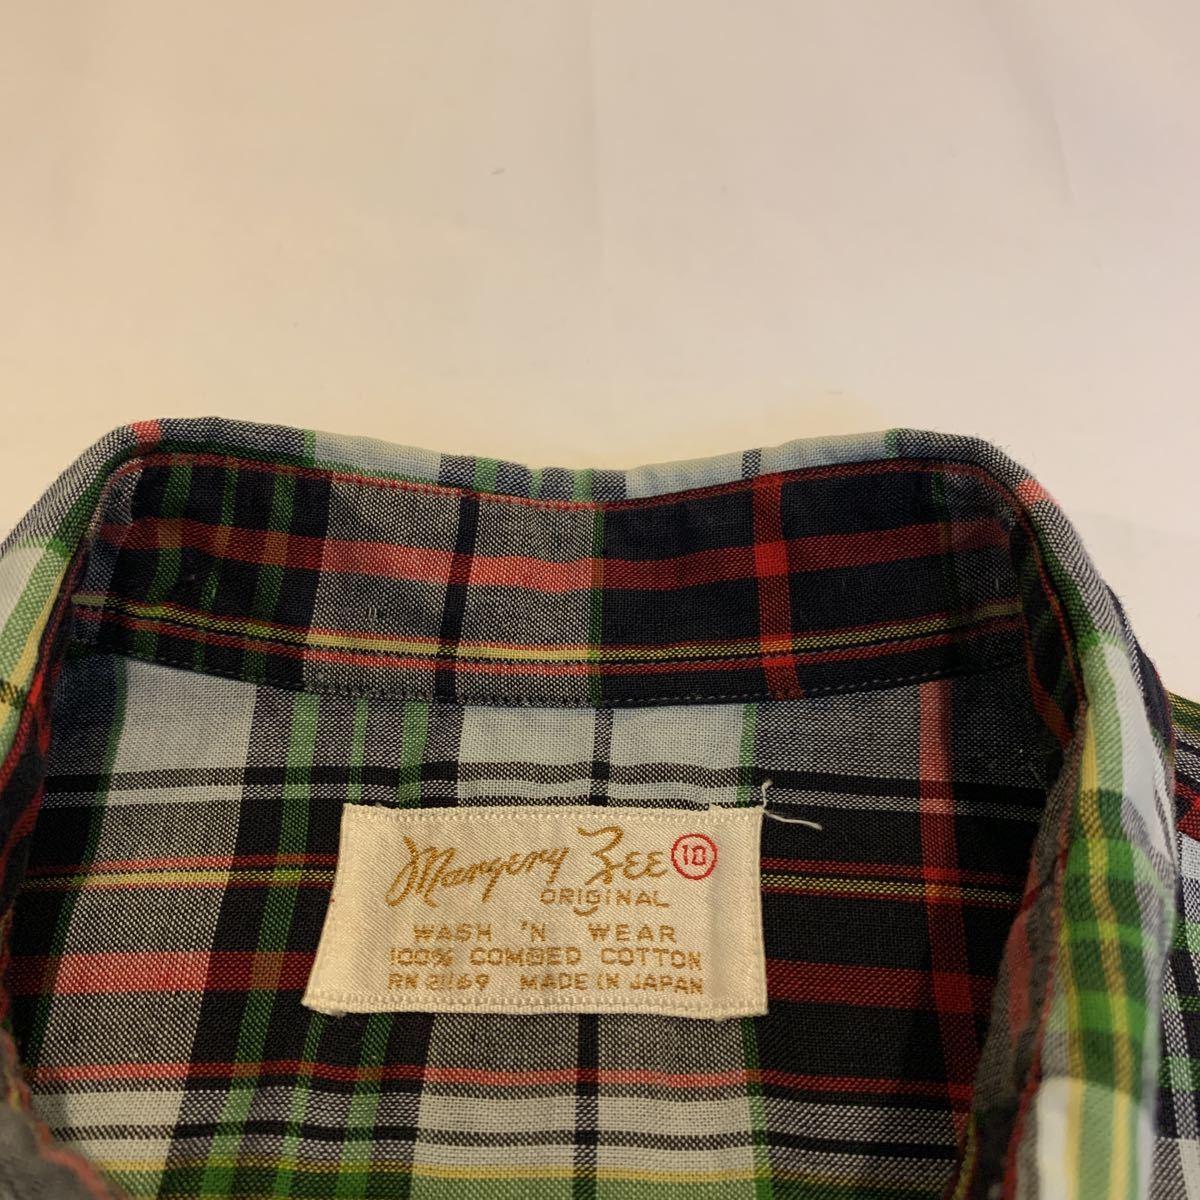 60s Maryery Zee MADRAS CHECK DRESS DEAD STOCK NOS ヴィンテージ ビンテージ マドラスチェック チェックワンピース デッドストック 50s_画像3